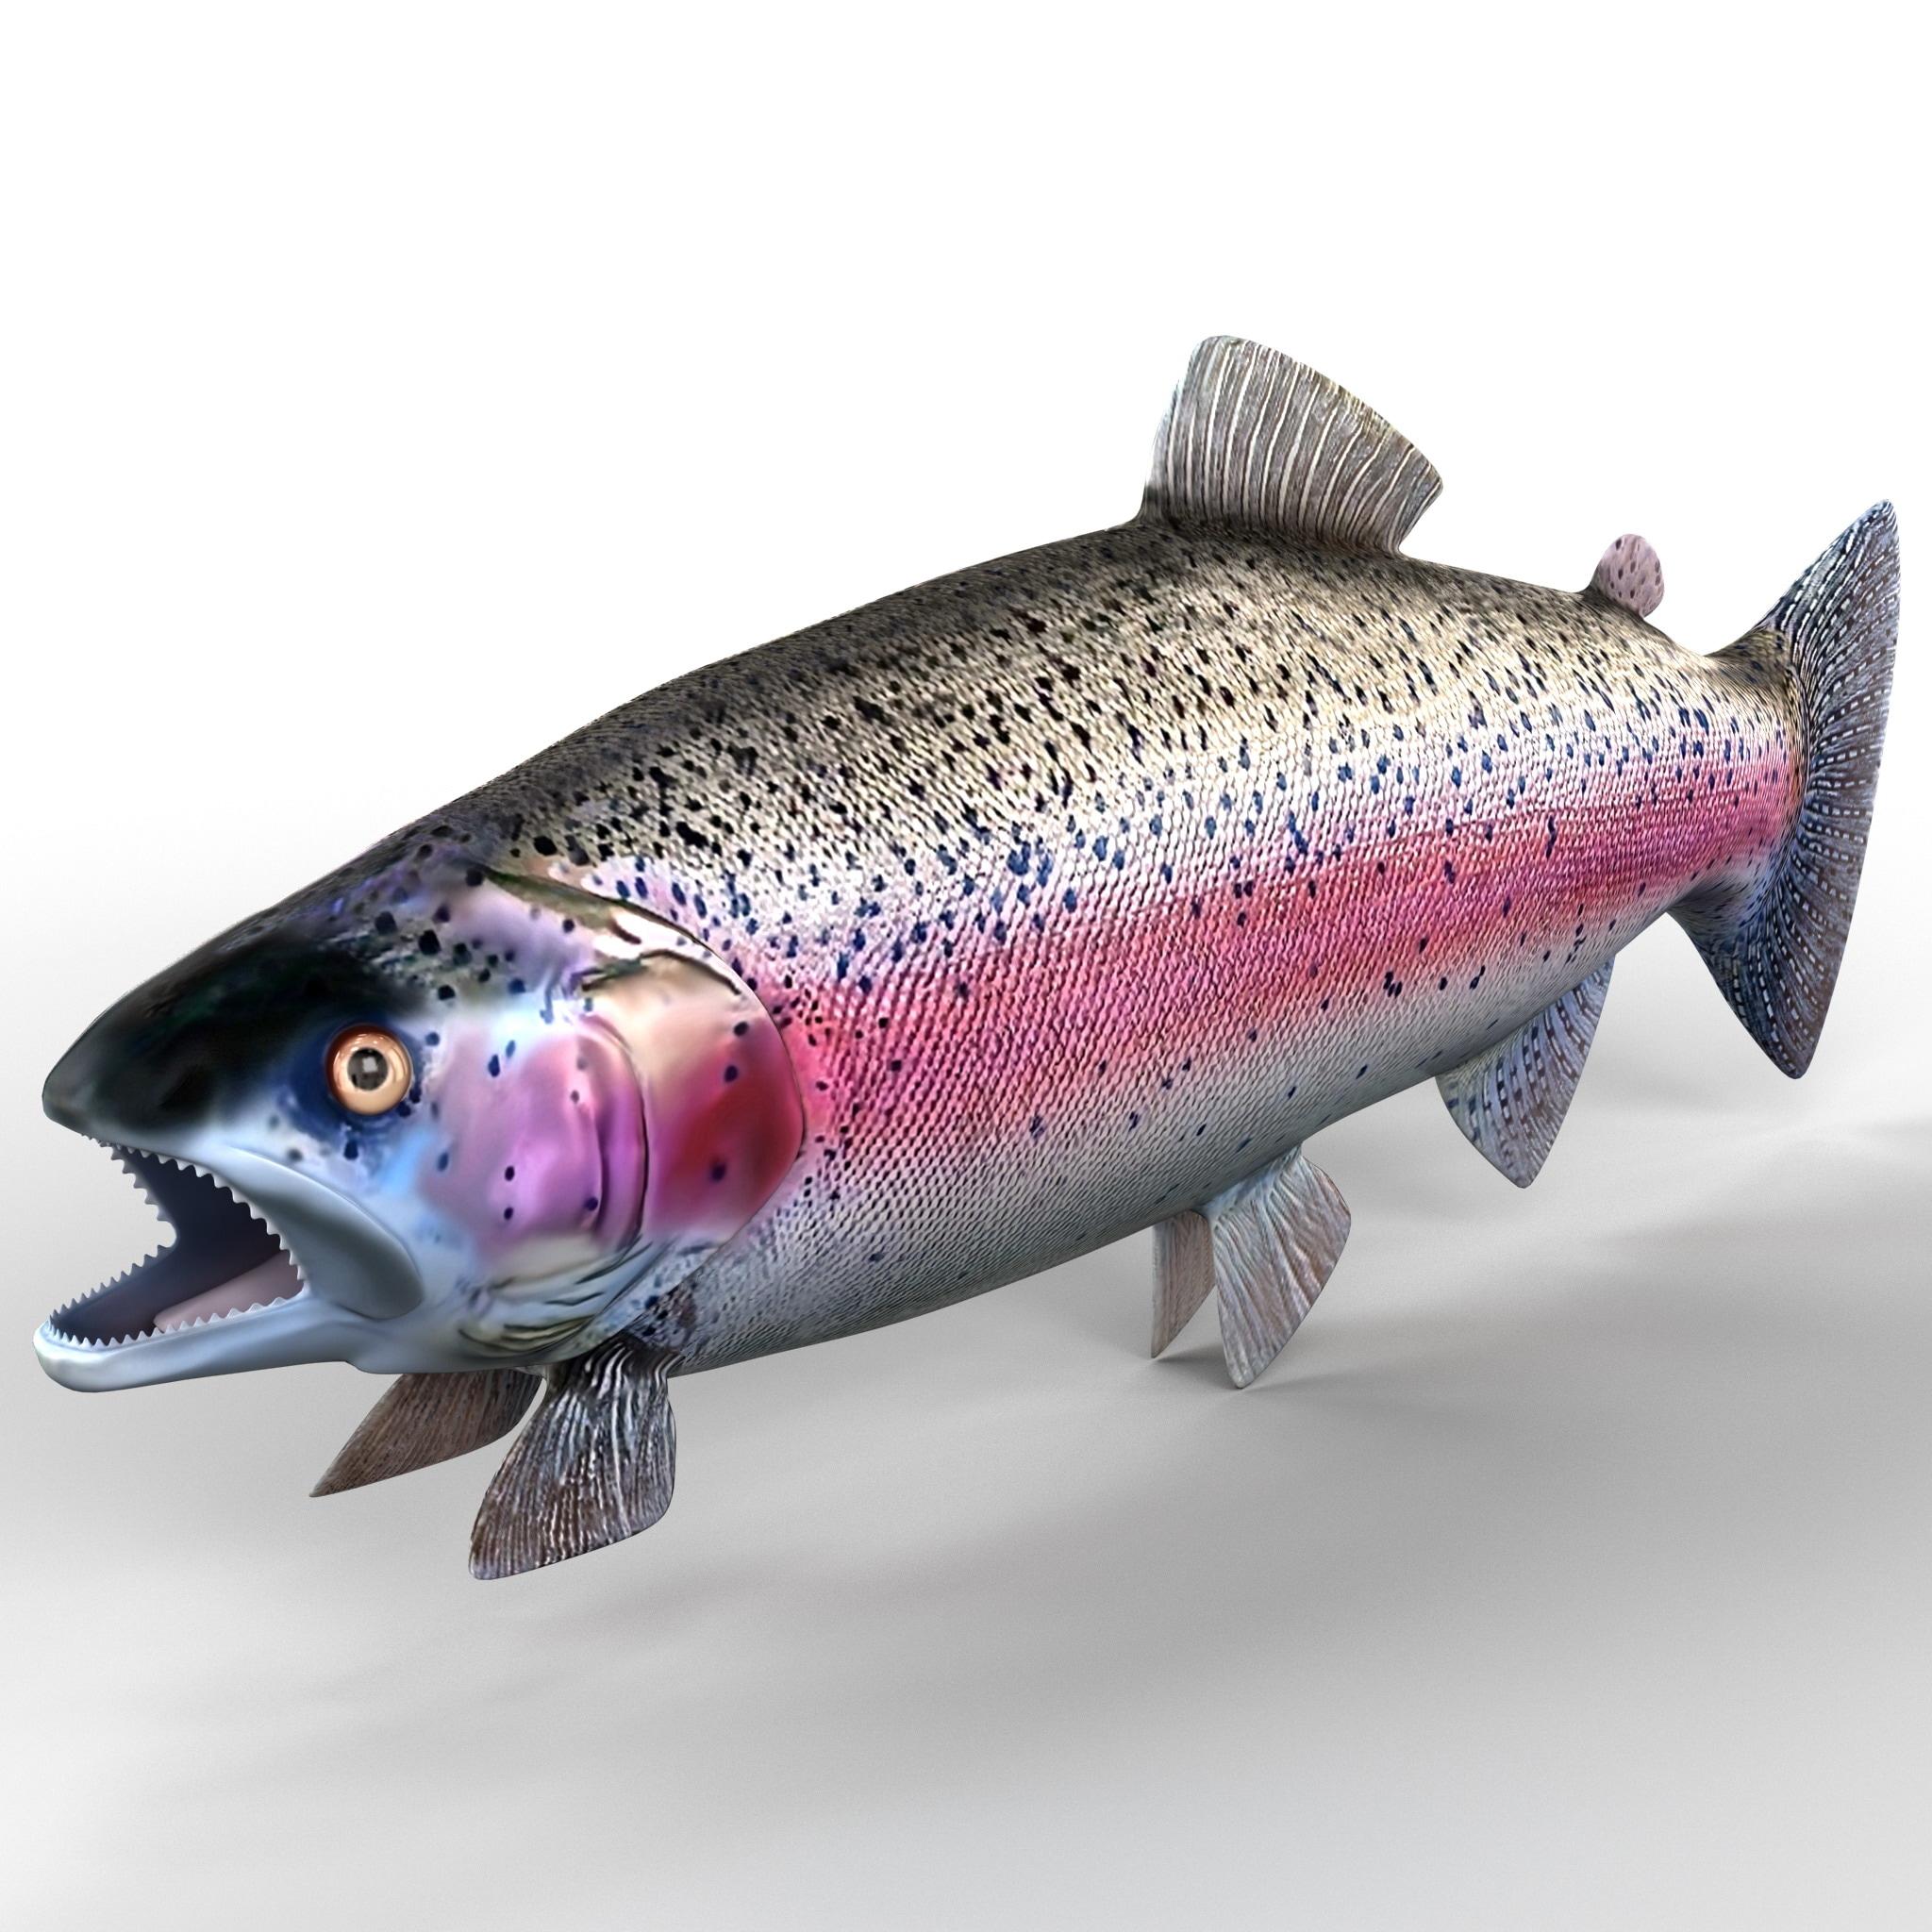 209580_Rainbow_Trout_001.jpg